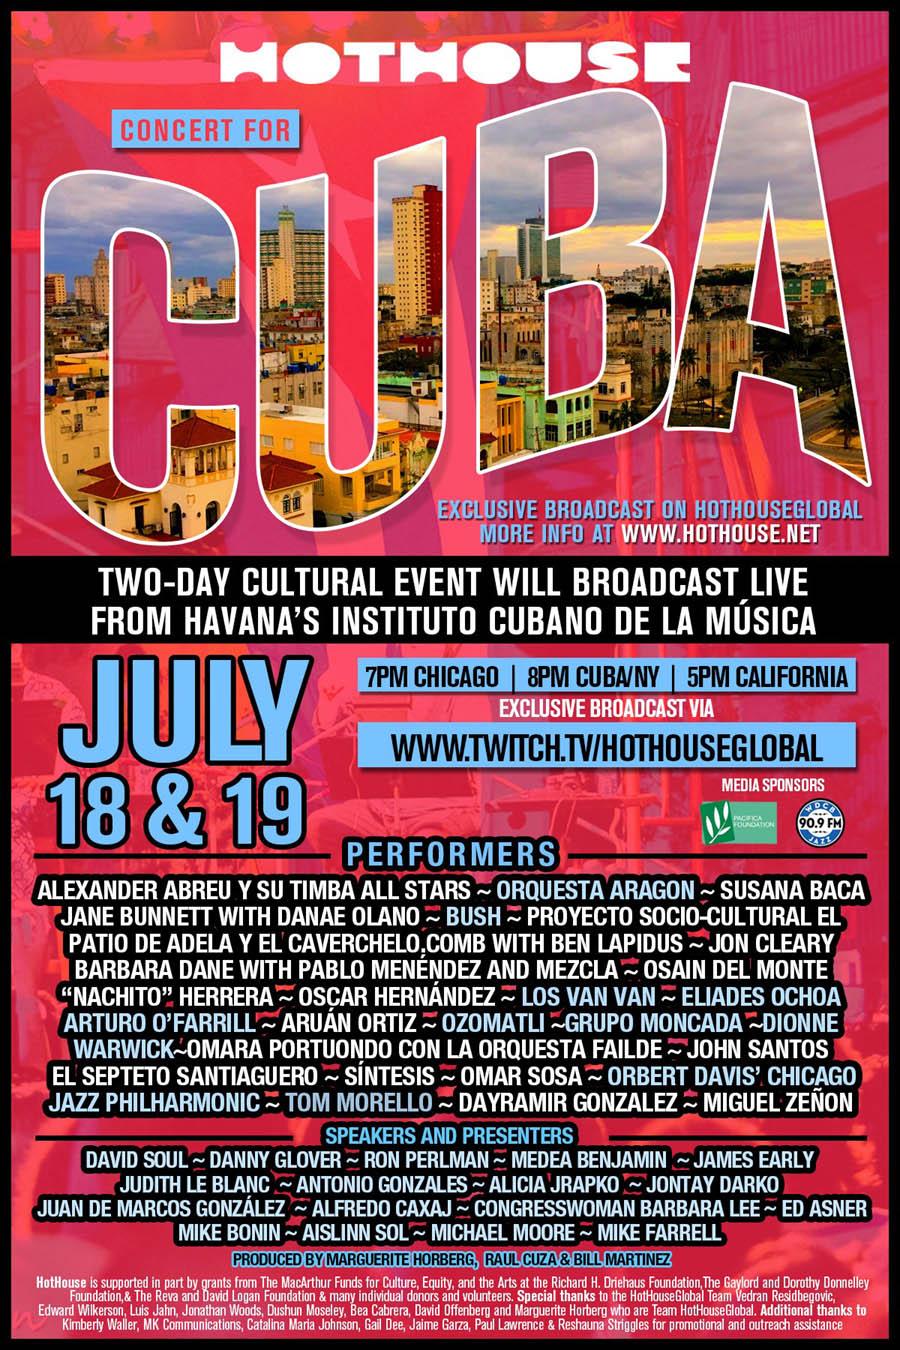 Hothouse Concert For Cuba